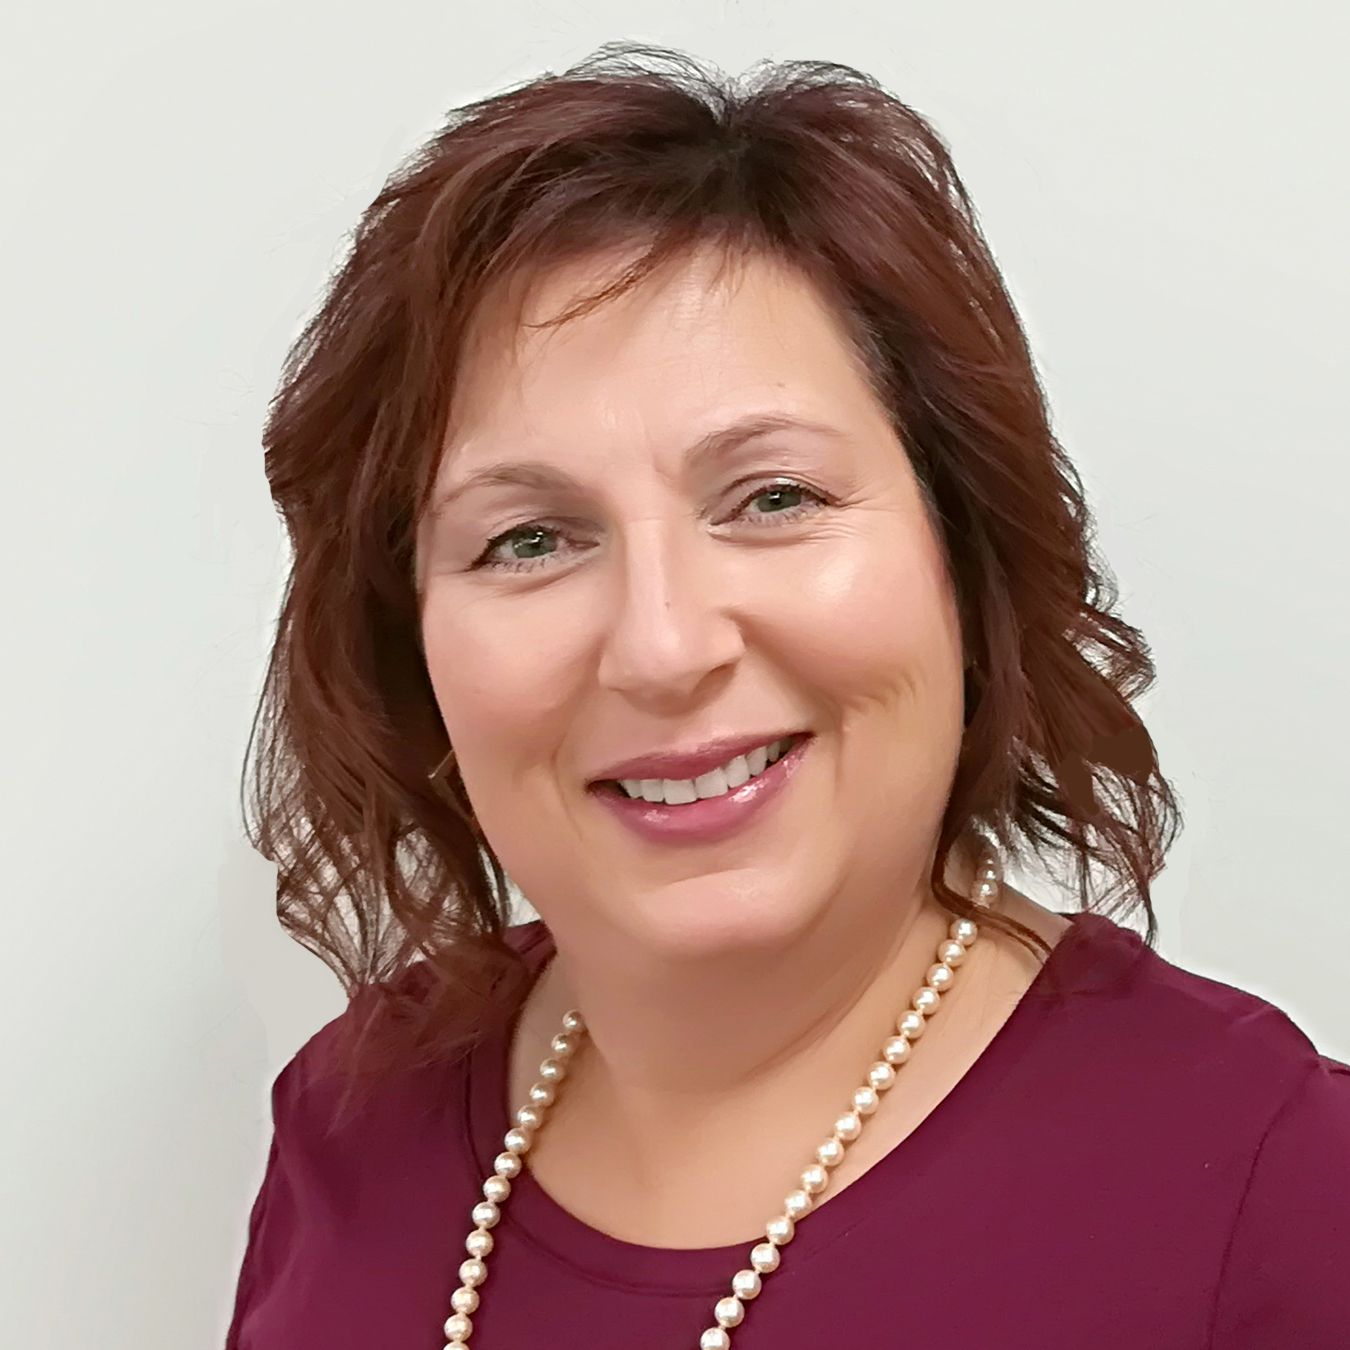 Debra Braun, RN, BS  - Jeron's New Clinical Education Specialist